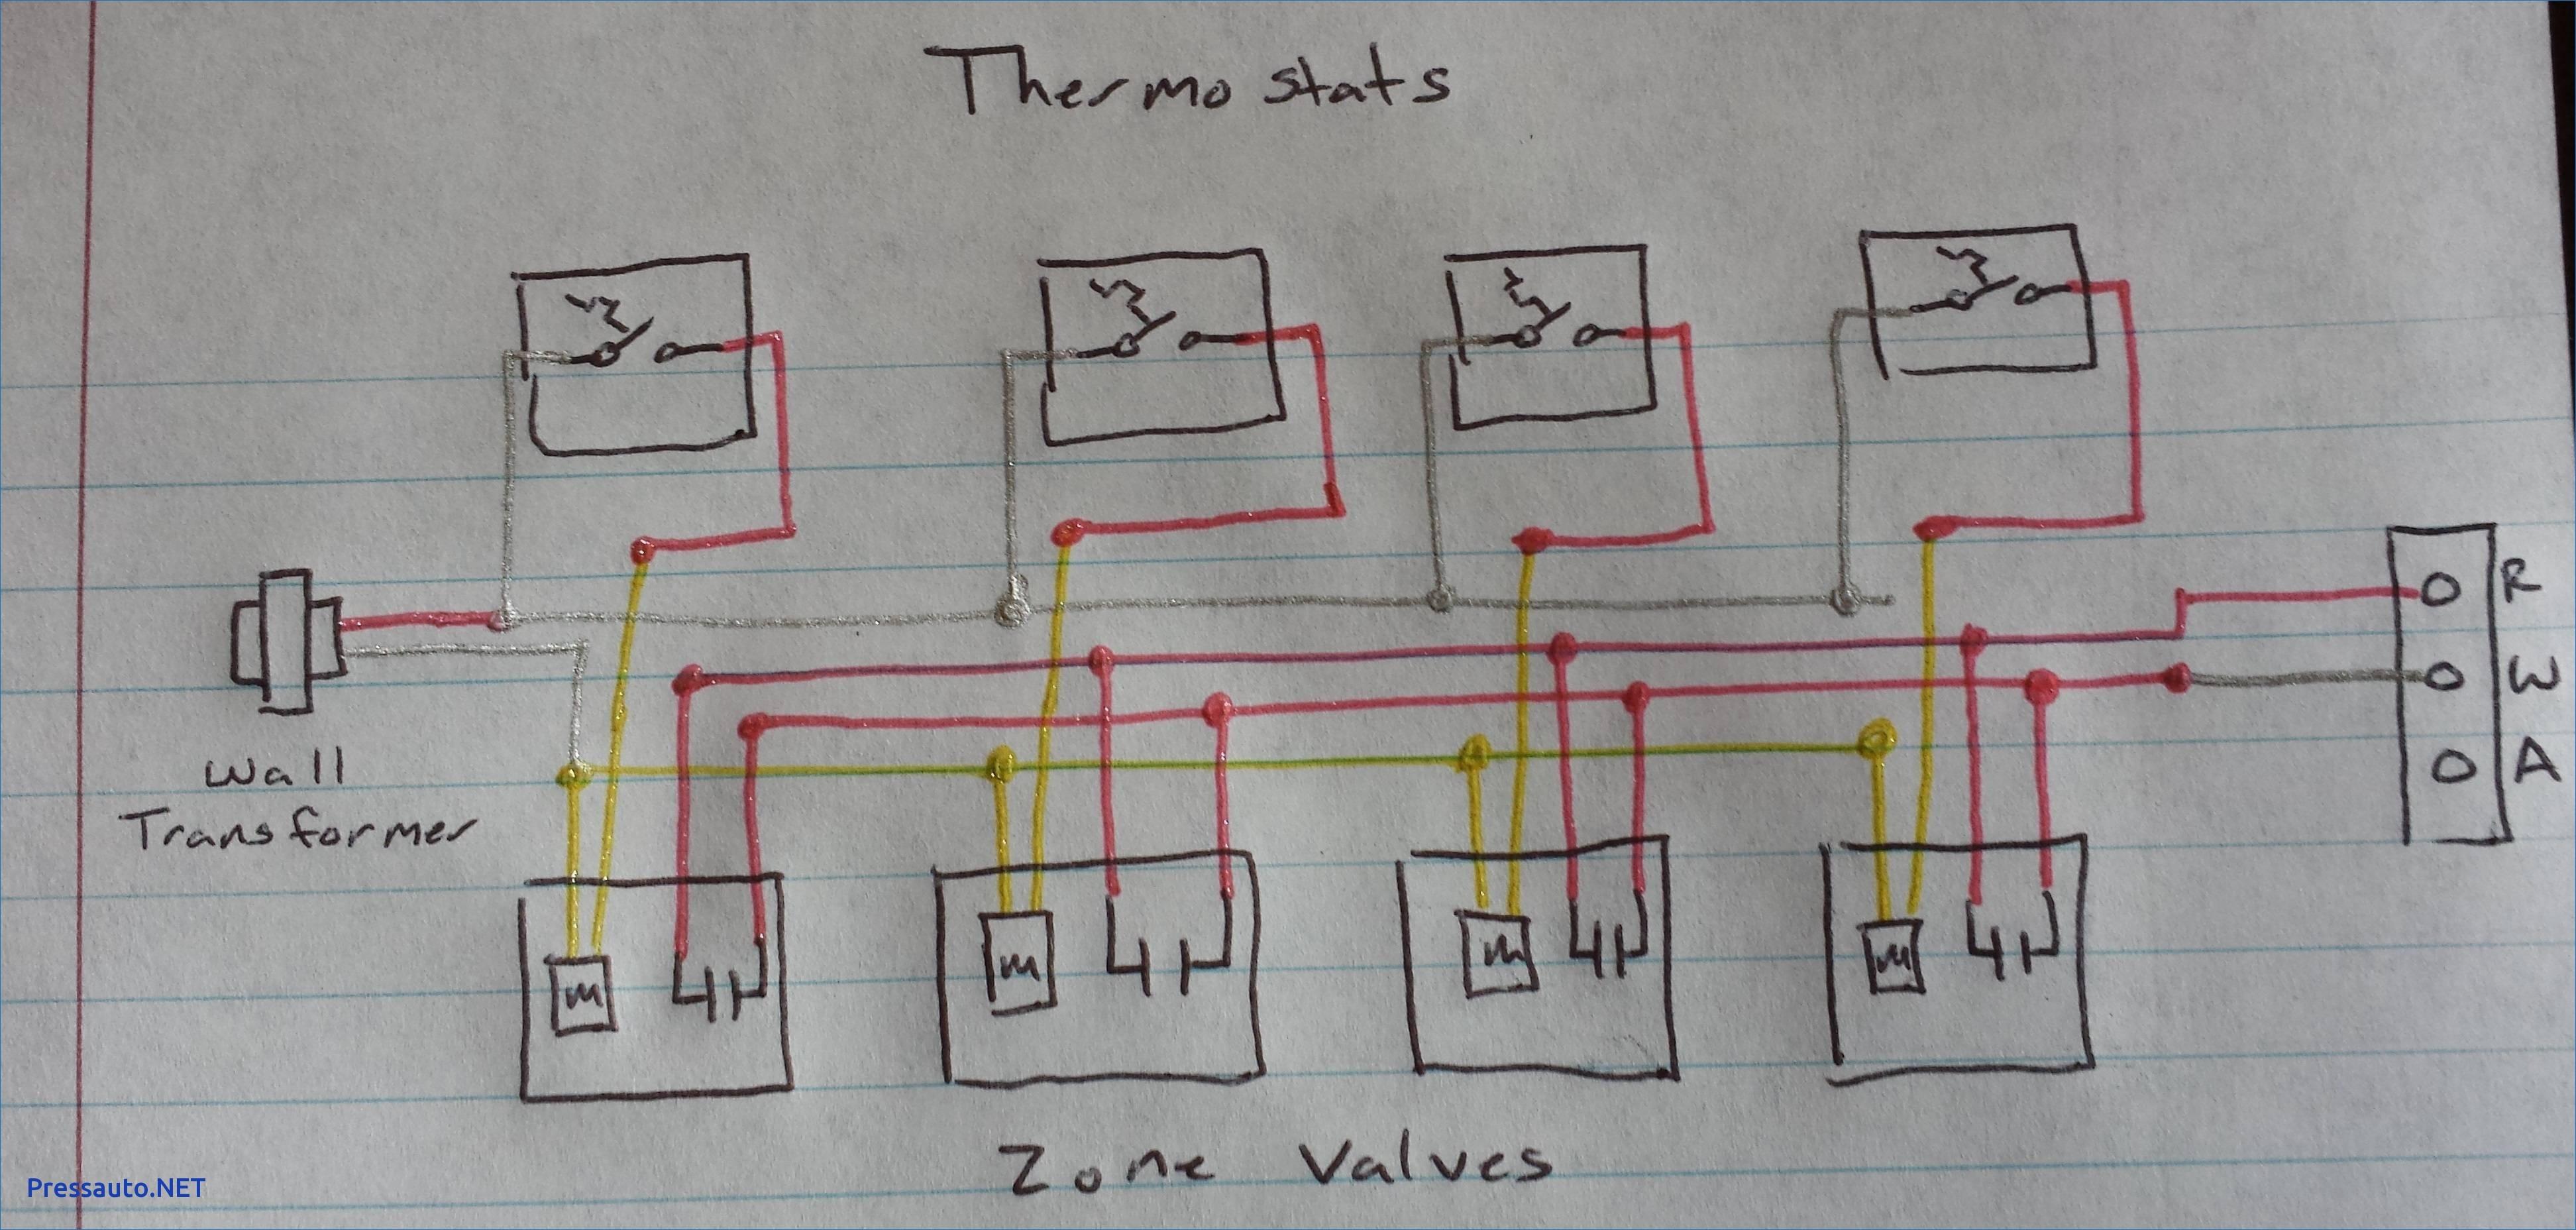 Honeywell 24 Volt Transformer Wiring Diagram New Wiring Diagram For - 24 Volt Wiring Diagram